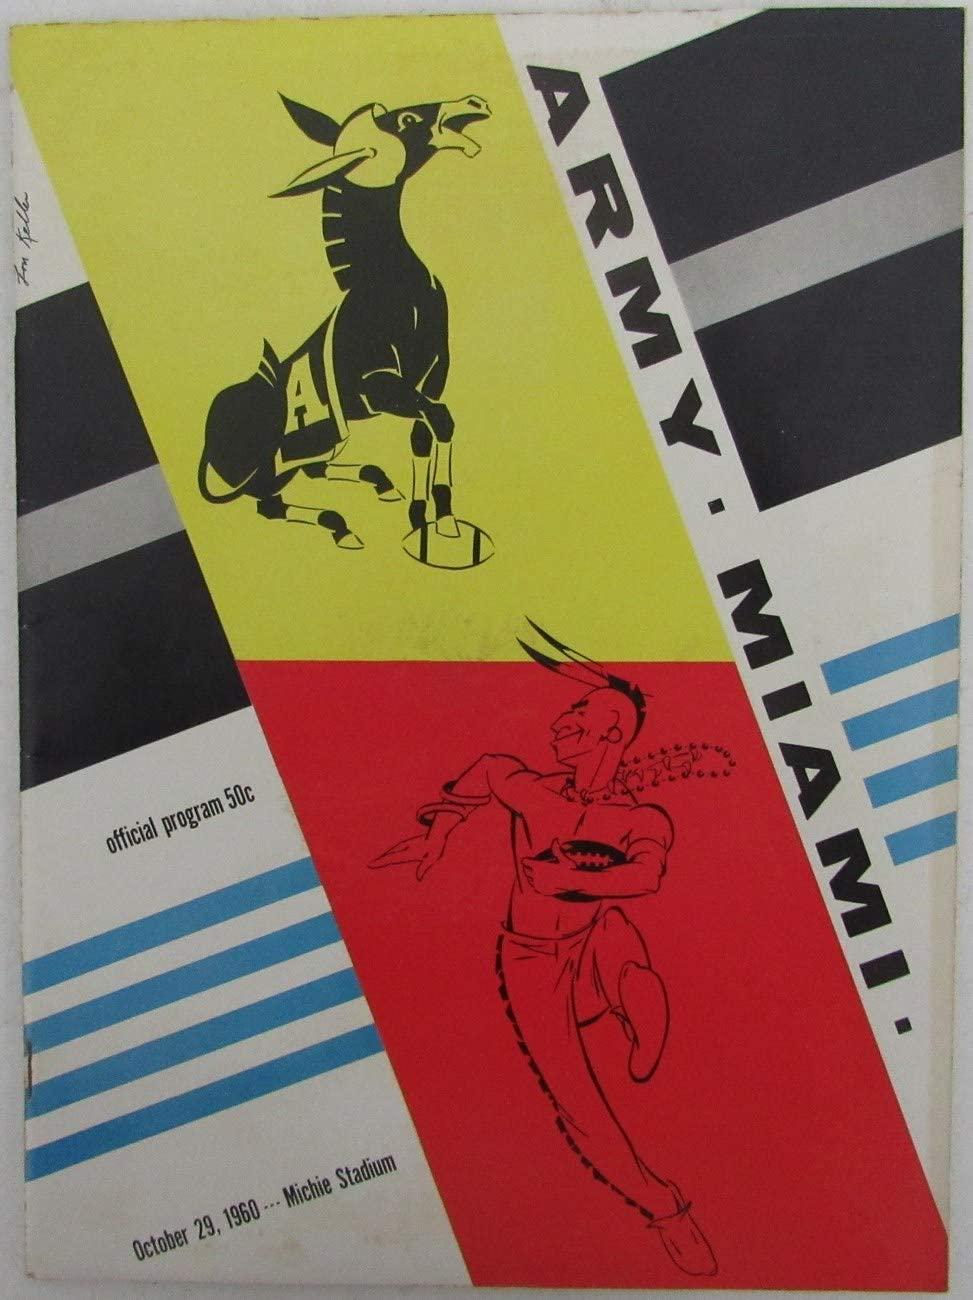 1960 Army vs. Miami College Football Game Program 148796